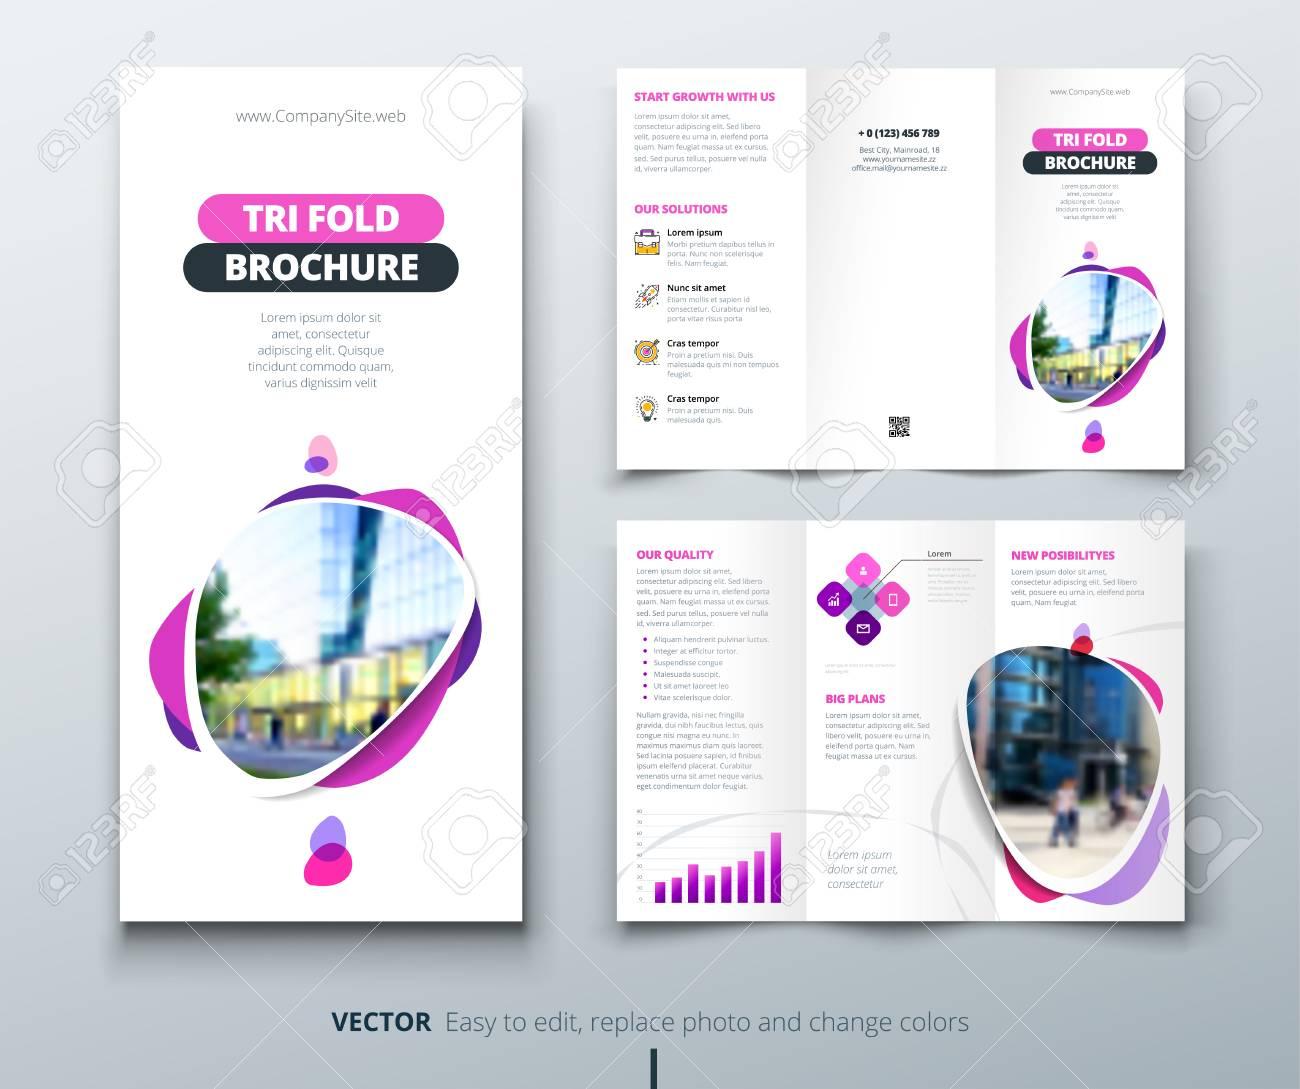 Business tri fold brochure design pink purple template for business tri fold brochure design pink purple template for tri fold flyer layout flashek Gallery